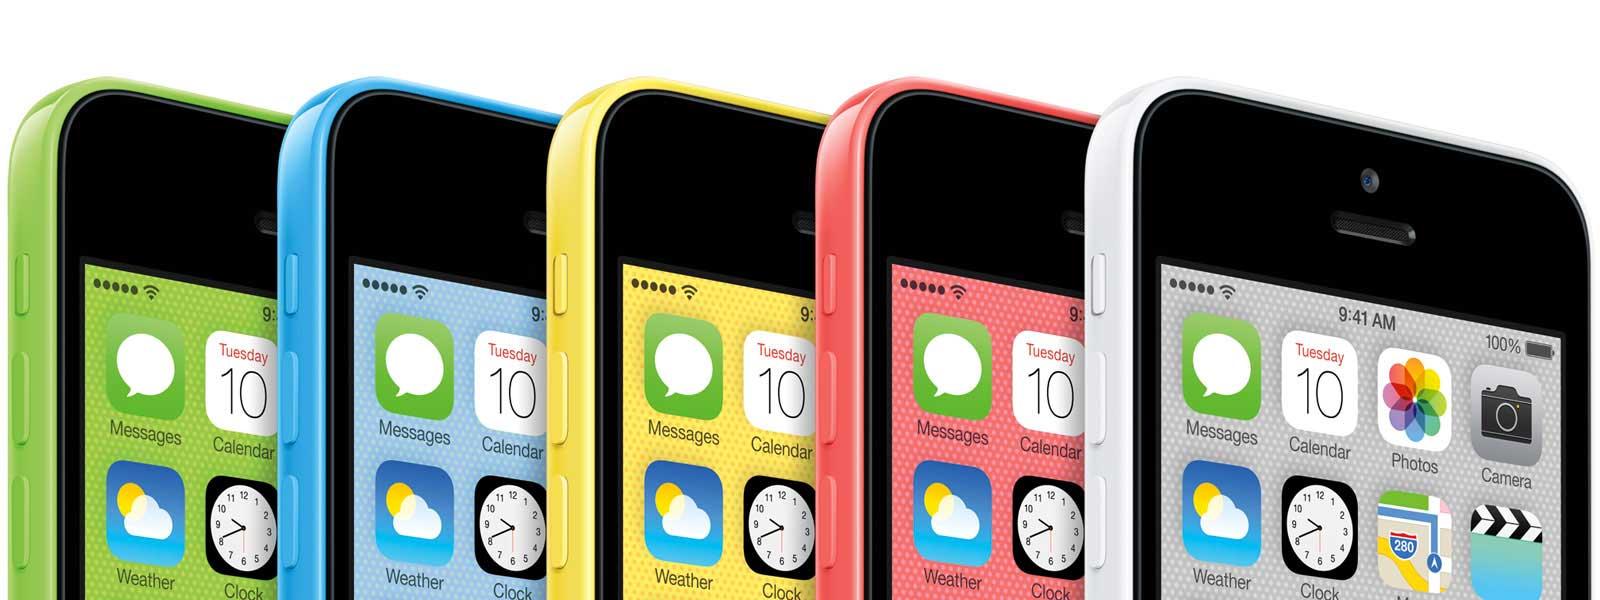 Apple-iPhone-5c-cover.jpg